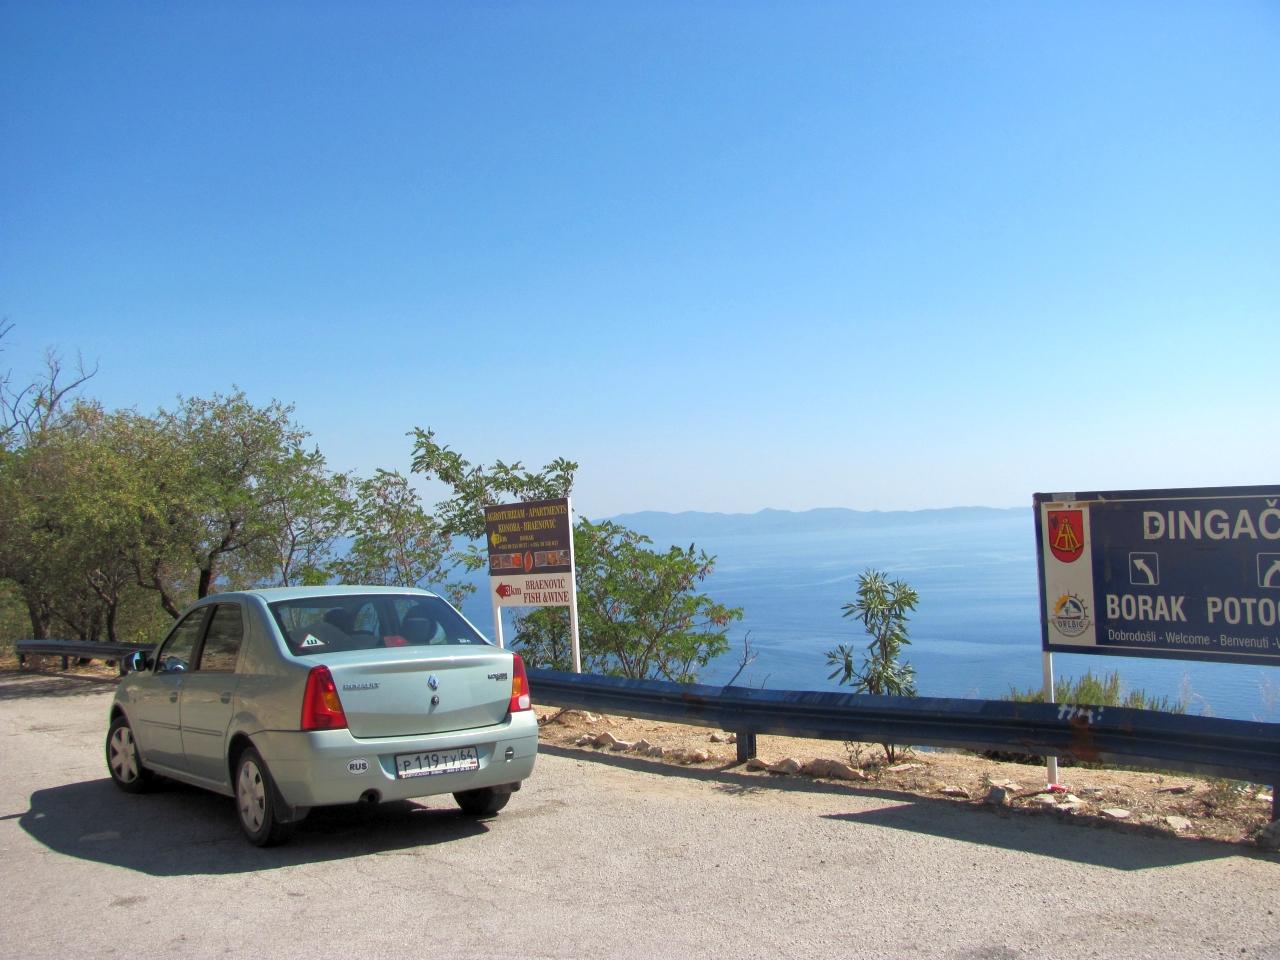 http://slopuhov.narod.ru/2012/pictures/greece/1280x960/img_3399.jpg